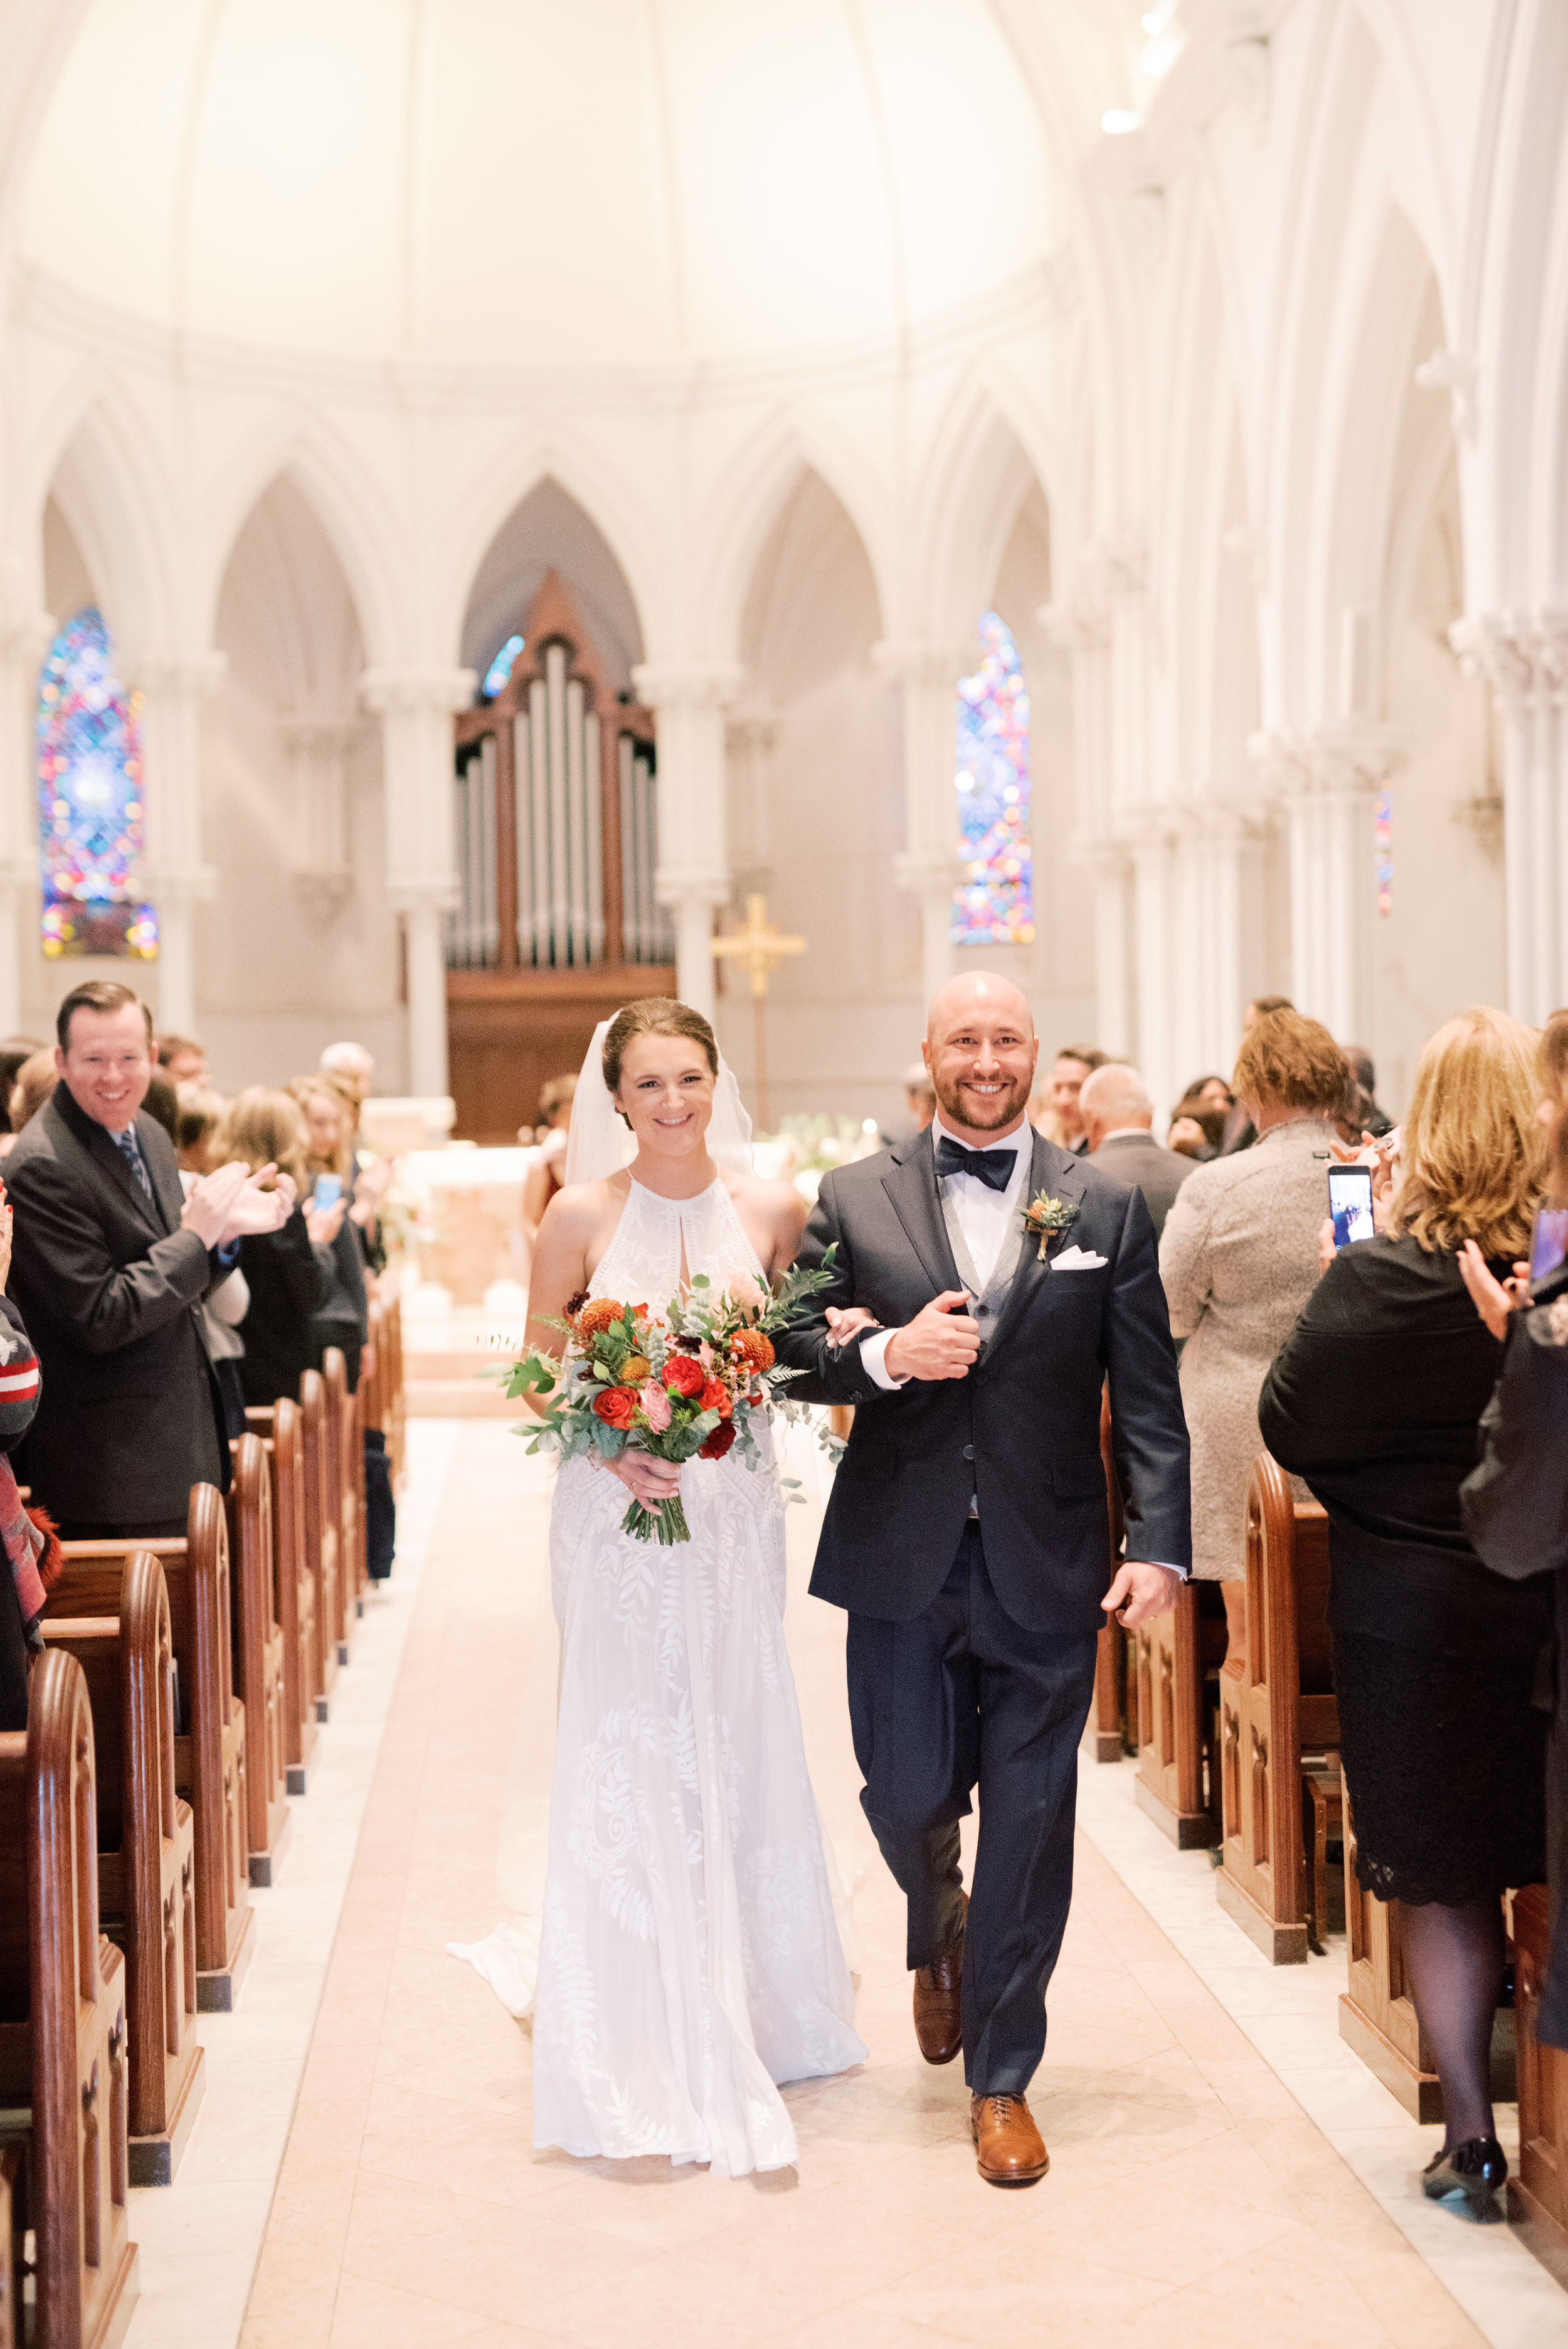 haley-richter-photography-october-pomme-wedding-in-radnor-033.jpg